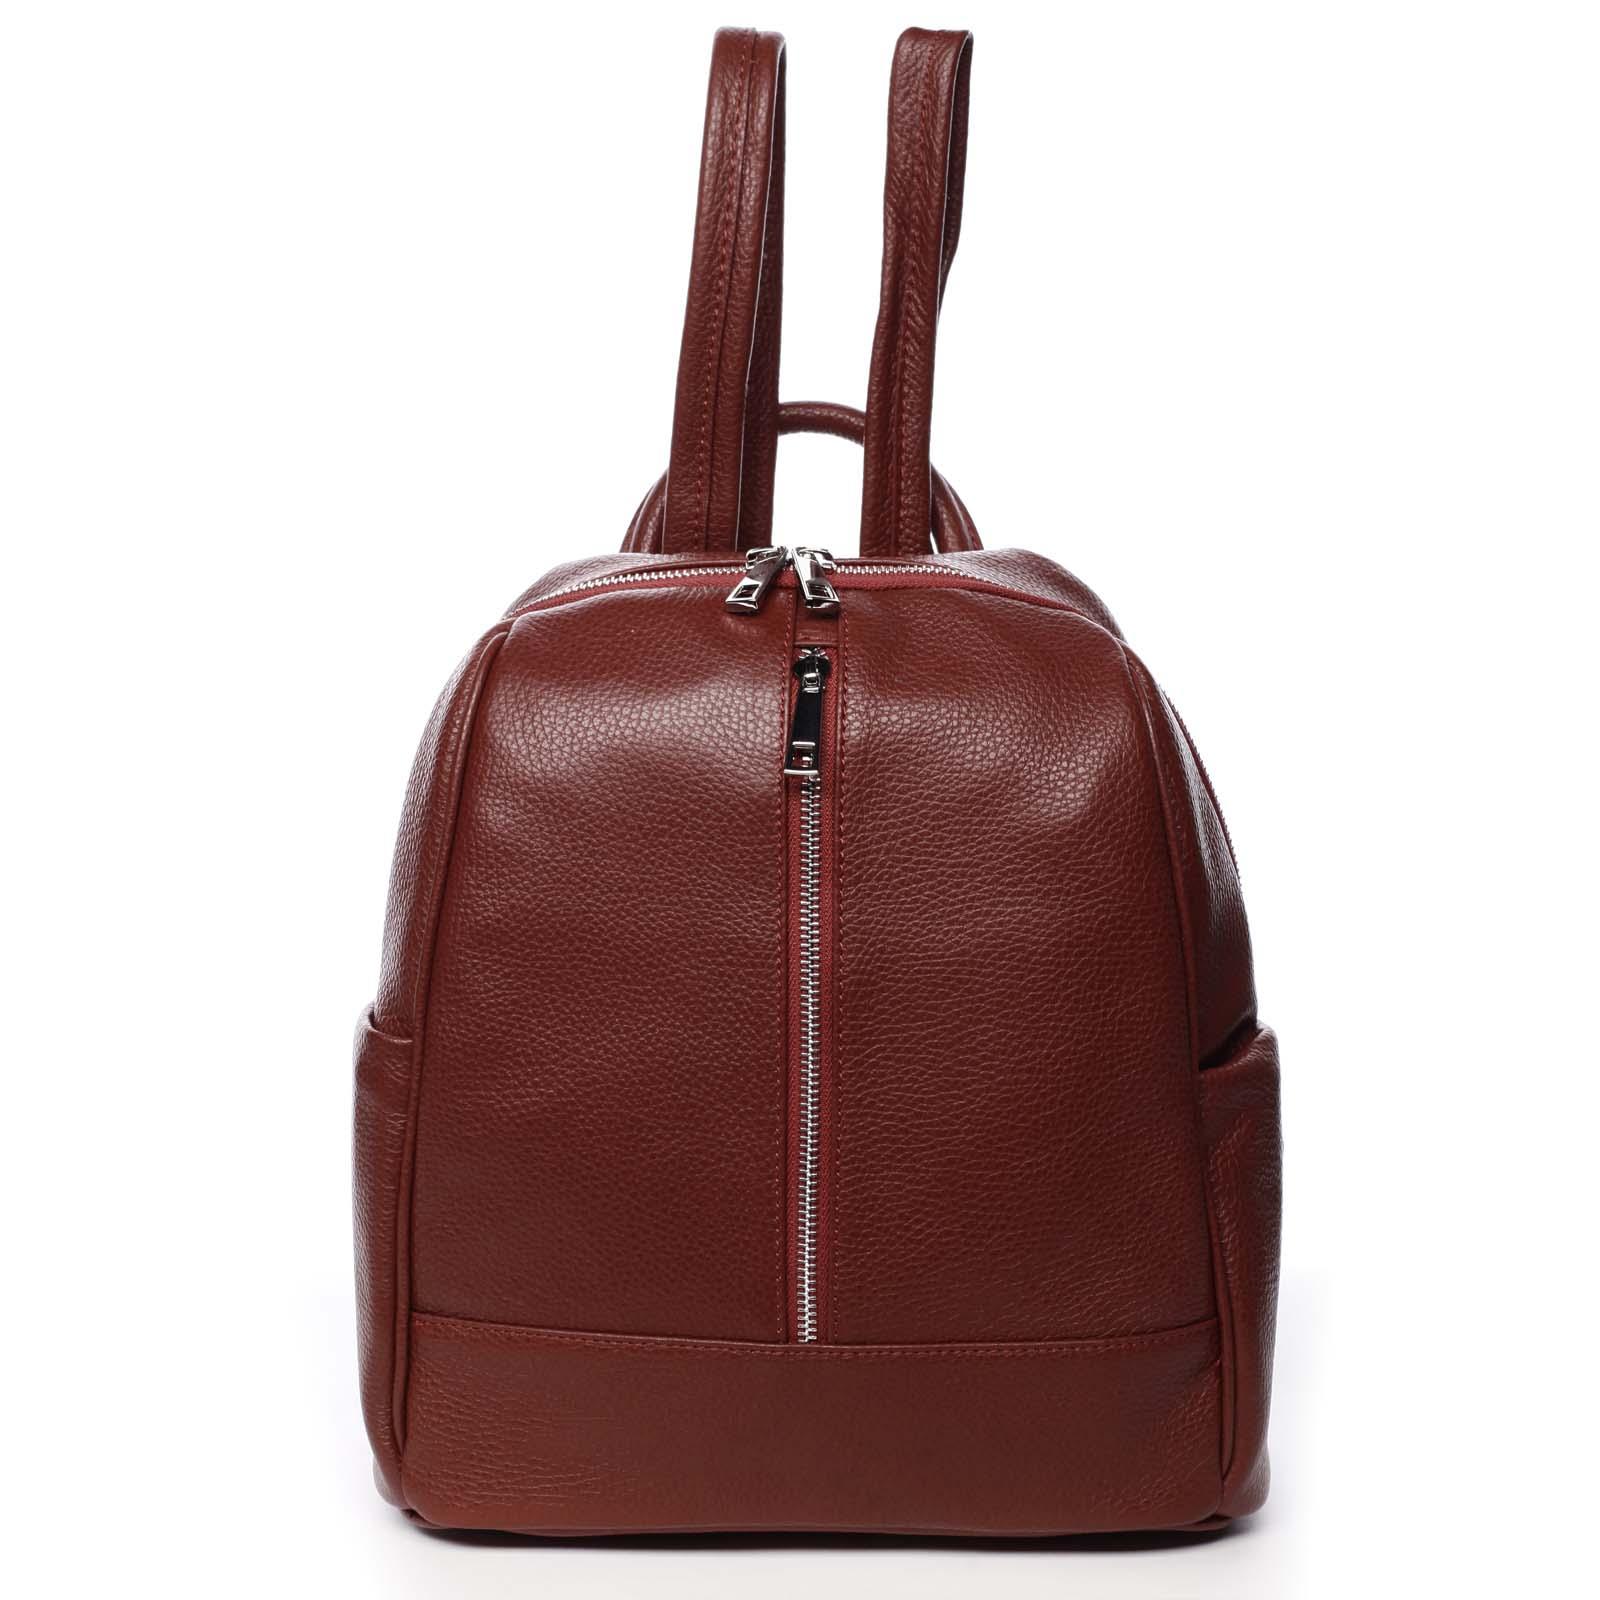 Dámský kožený batoh červený - ItalY Lissetta